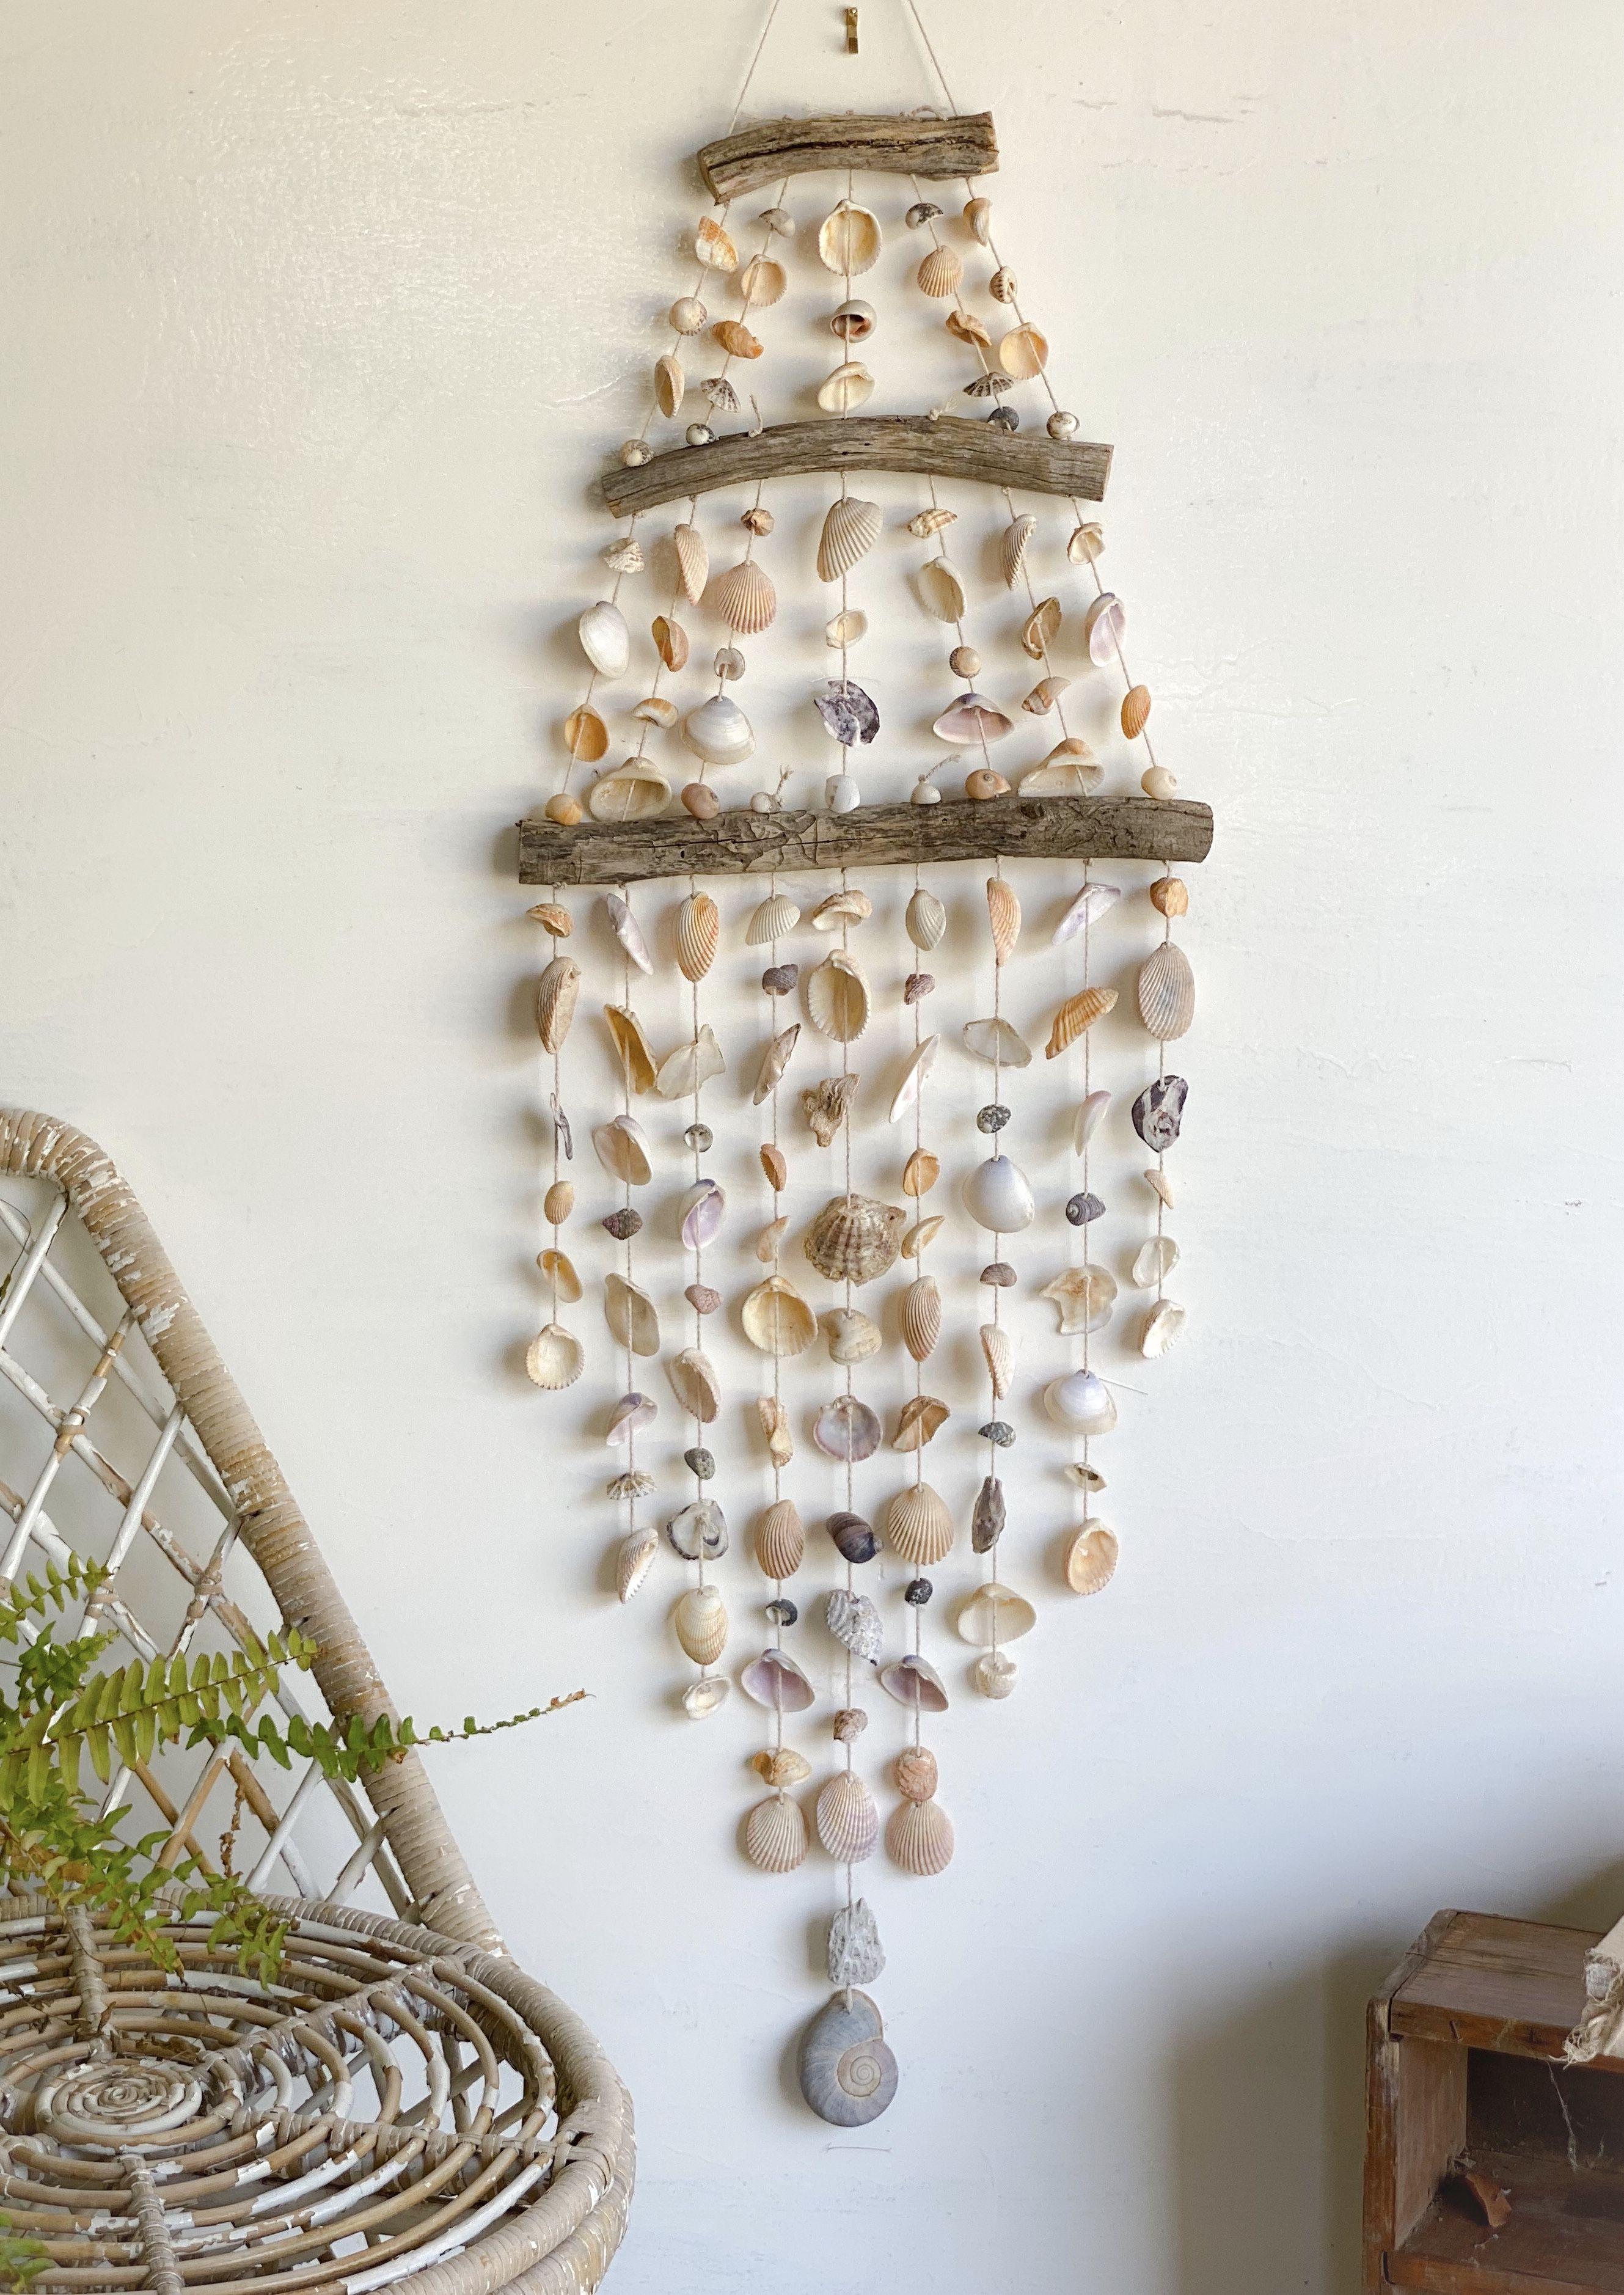 Extra Large Shell Wall Hanging In 2020 Seashell Wall Art Beach House Wall Decor Driftwood Wall Art